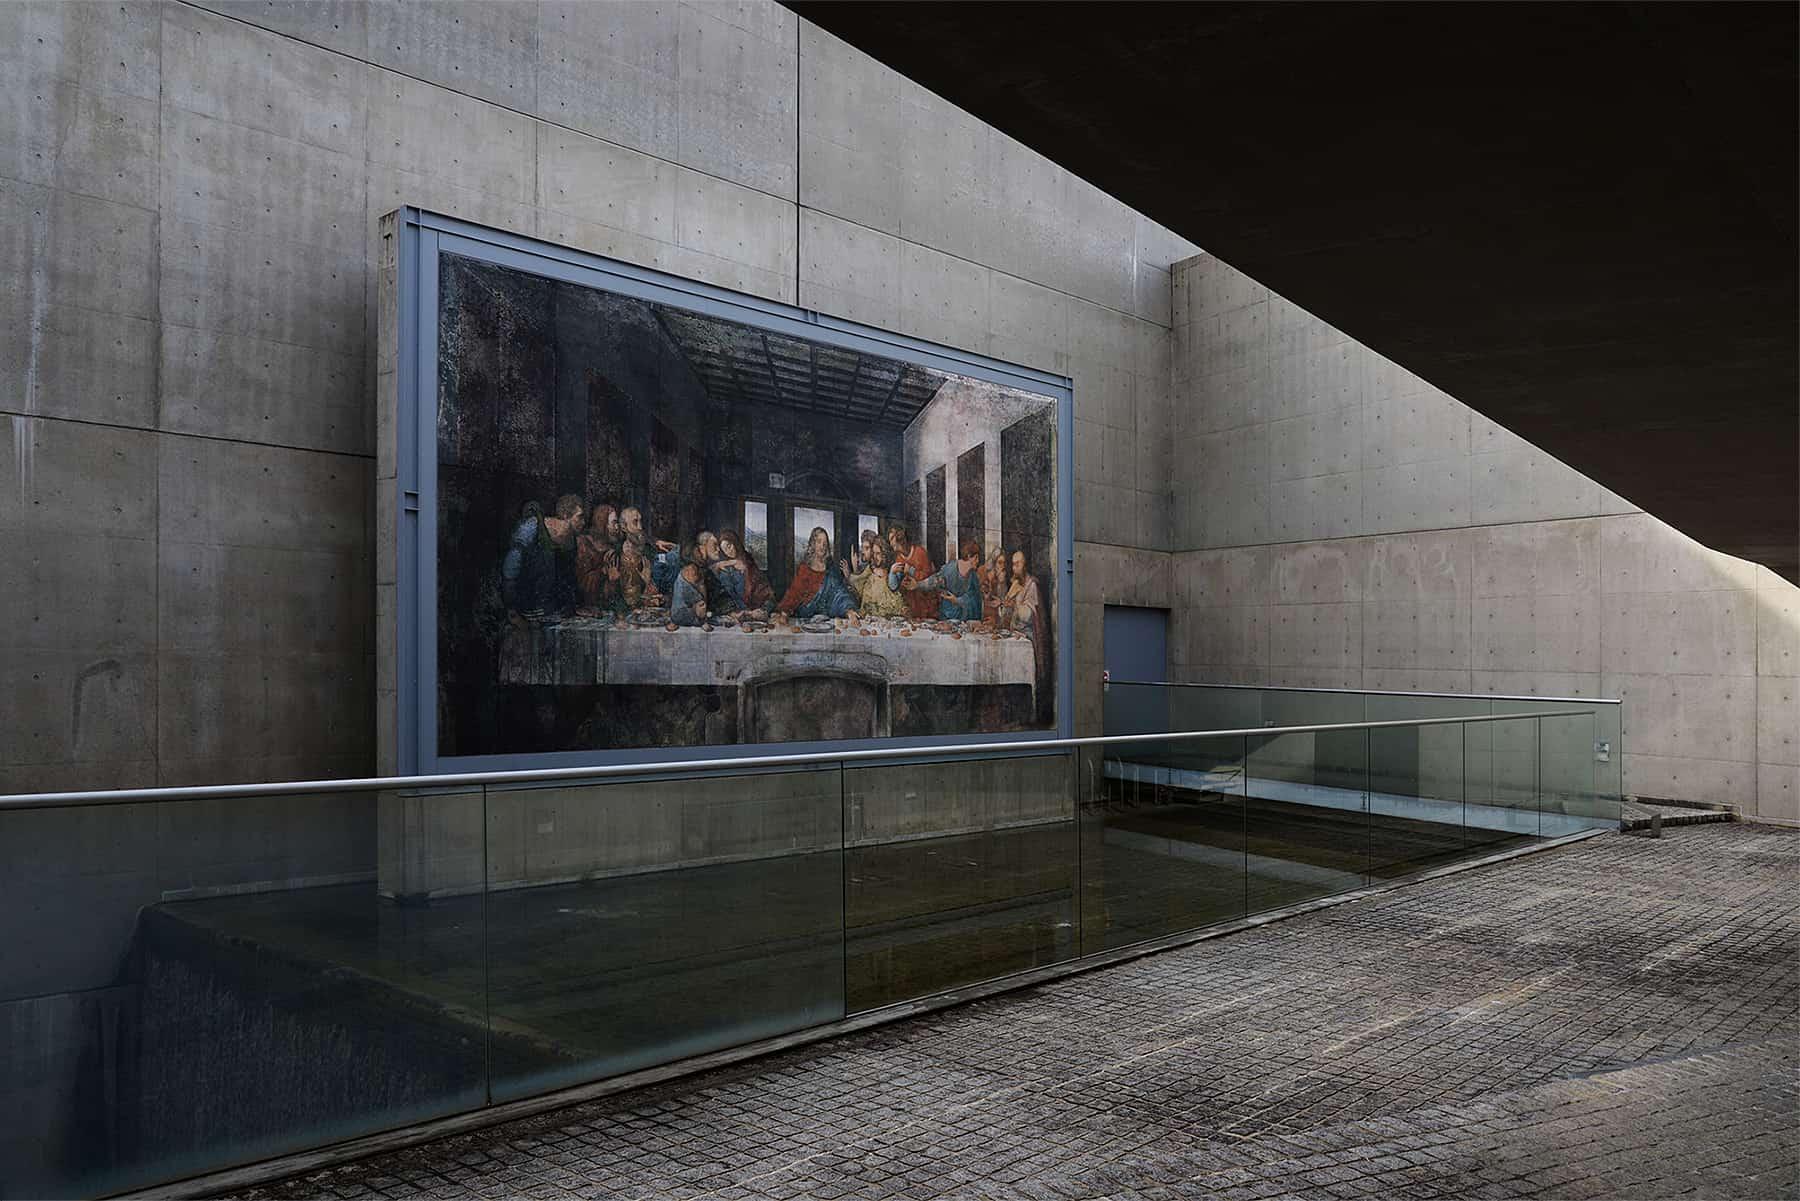 The Last Supper โดย Leonardo da Vinci